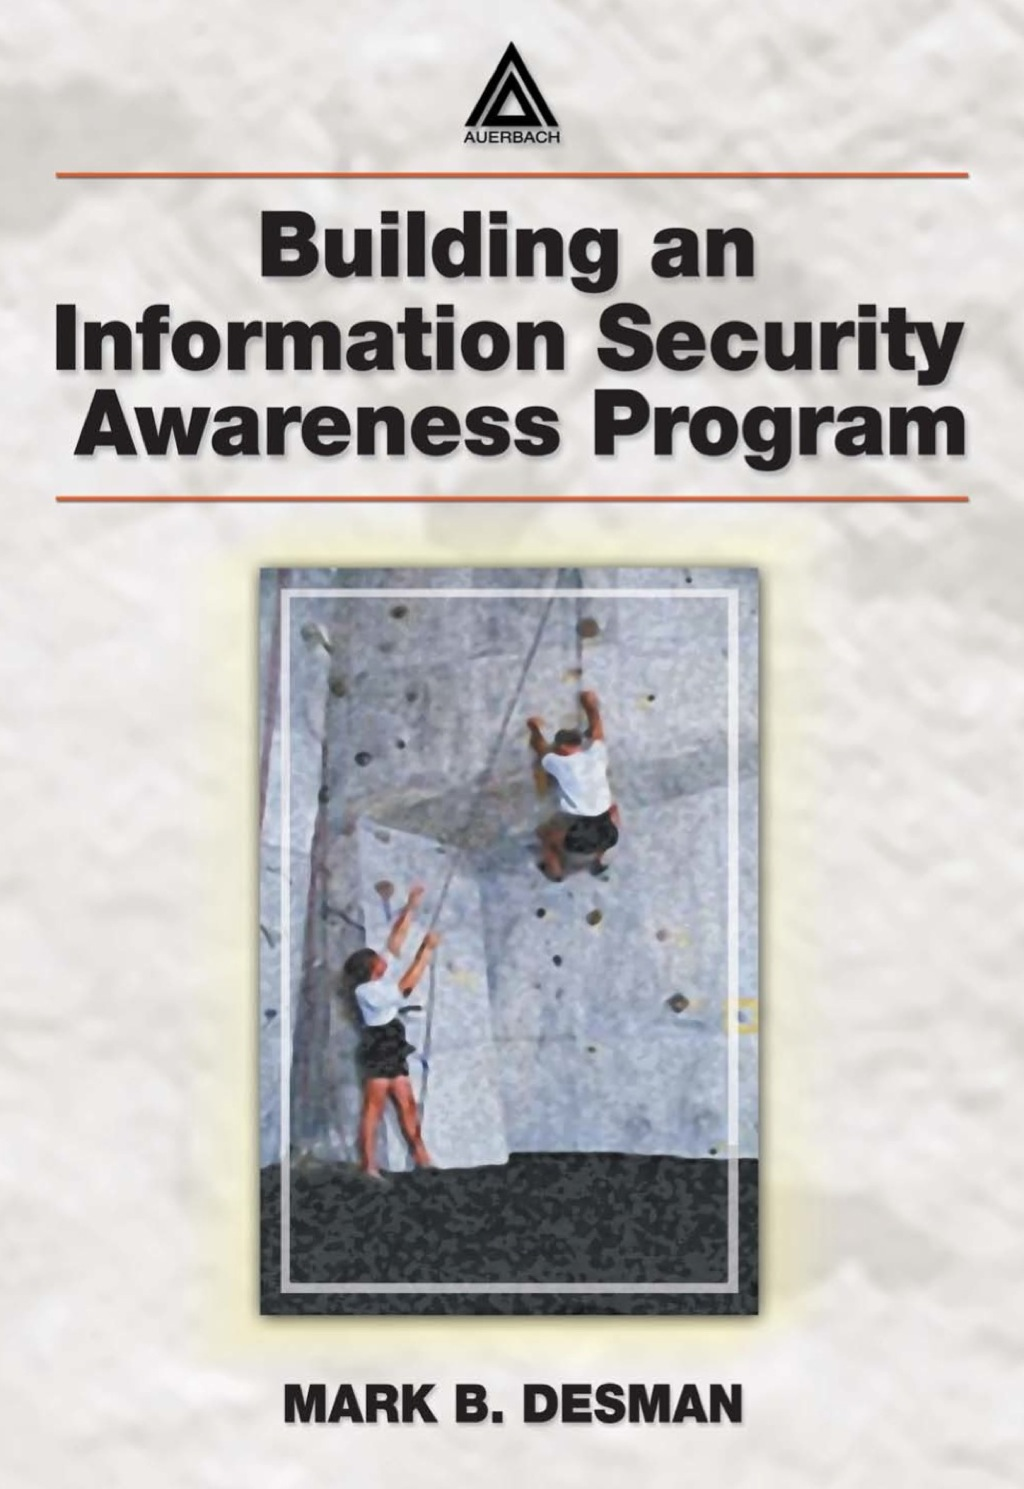 ISBN 9781420000054 product image for Building an Information Security Awareness Program (eBook Rental) | upcitemdb.com